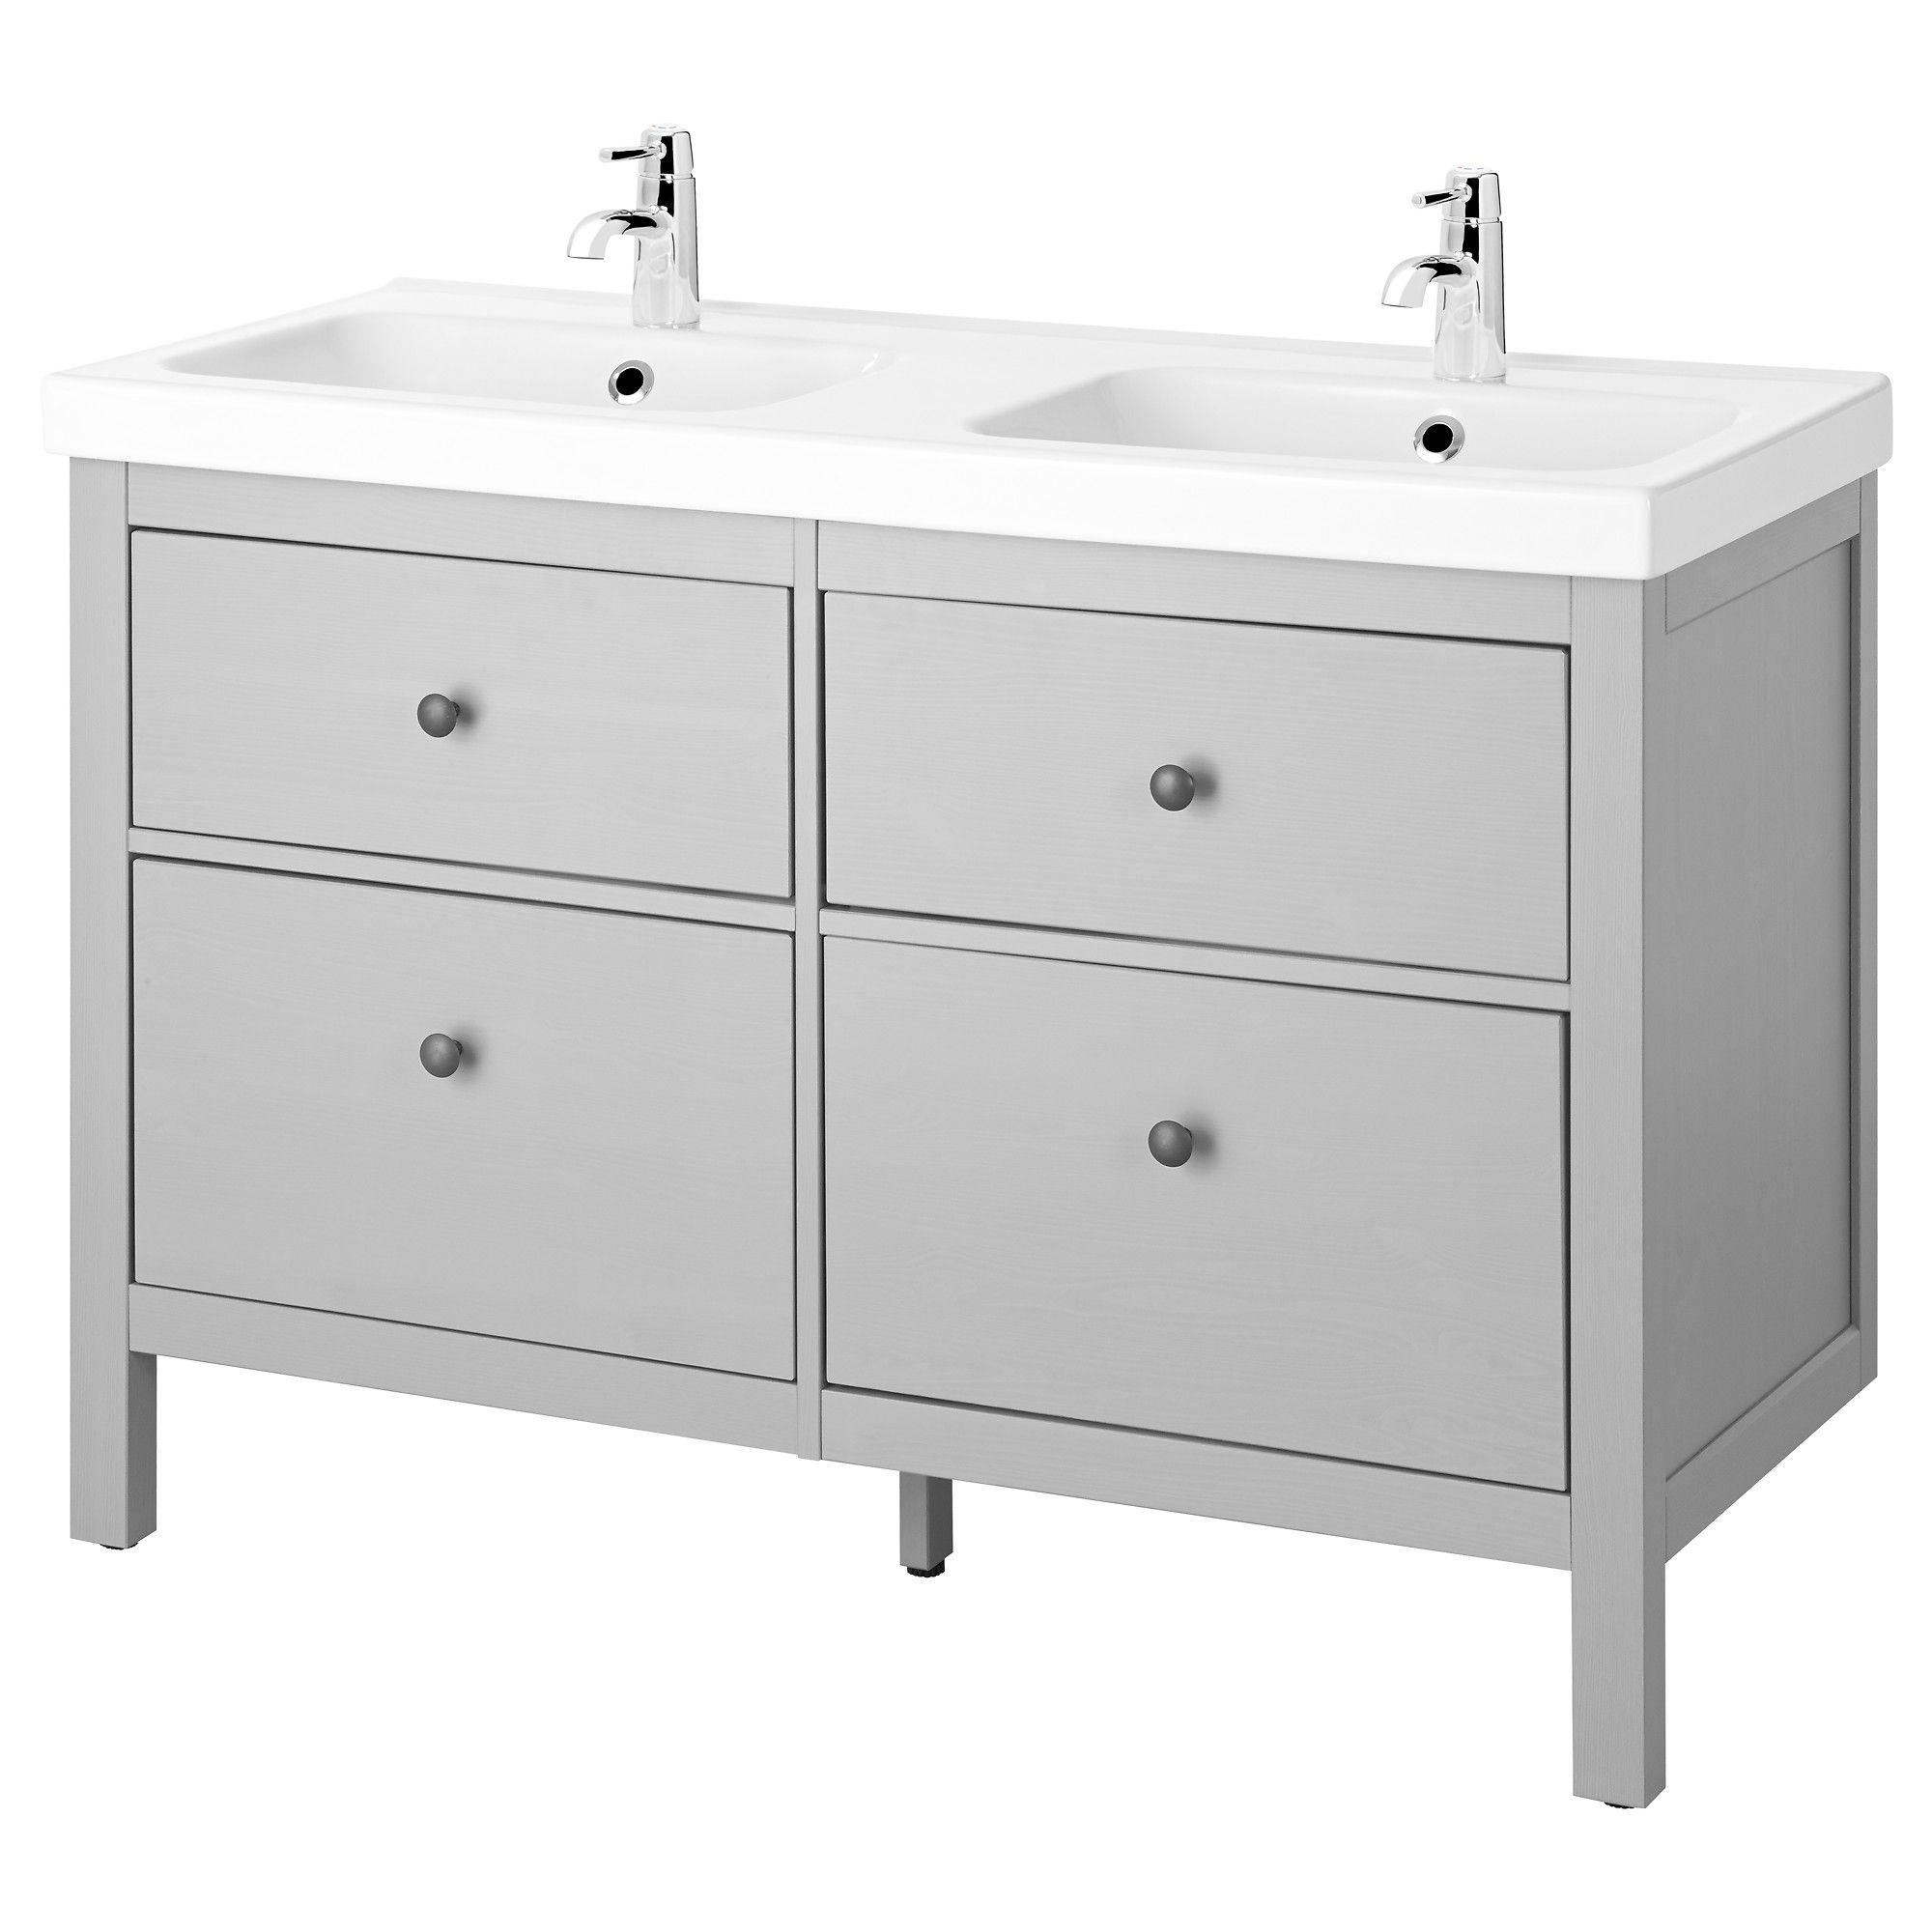 HEMNES / ODENSVIK Sink cabinet with 4 drawers, gray | HEMNES, Sinks ...